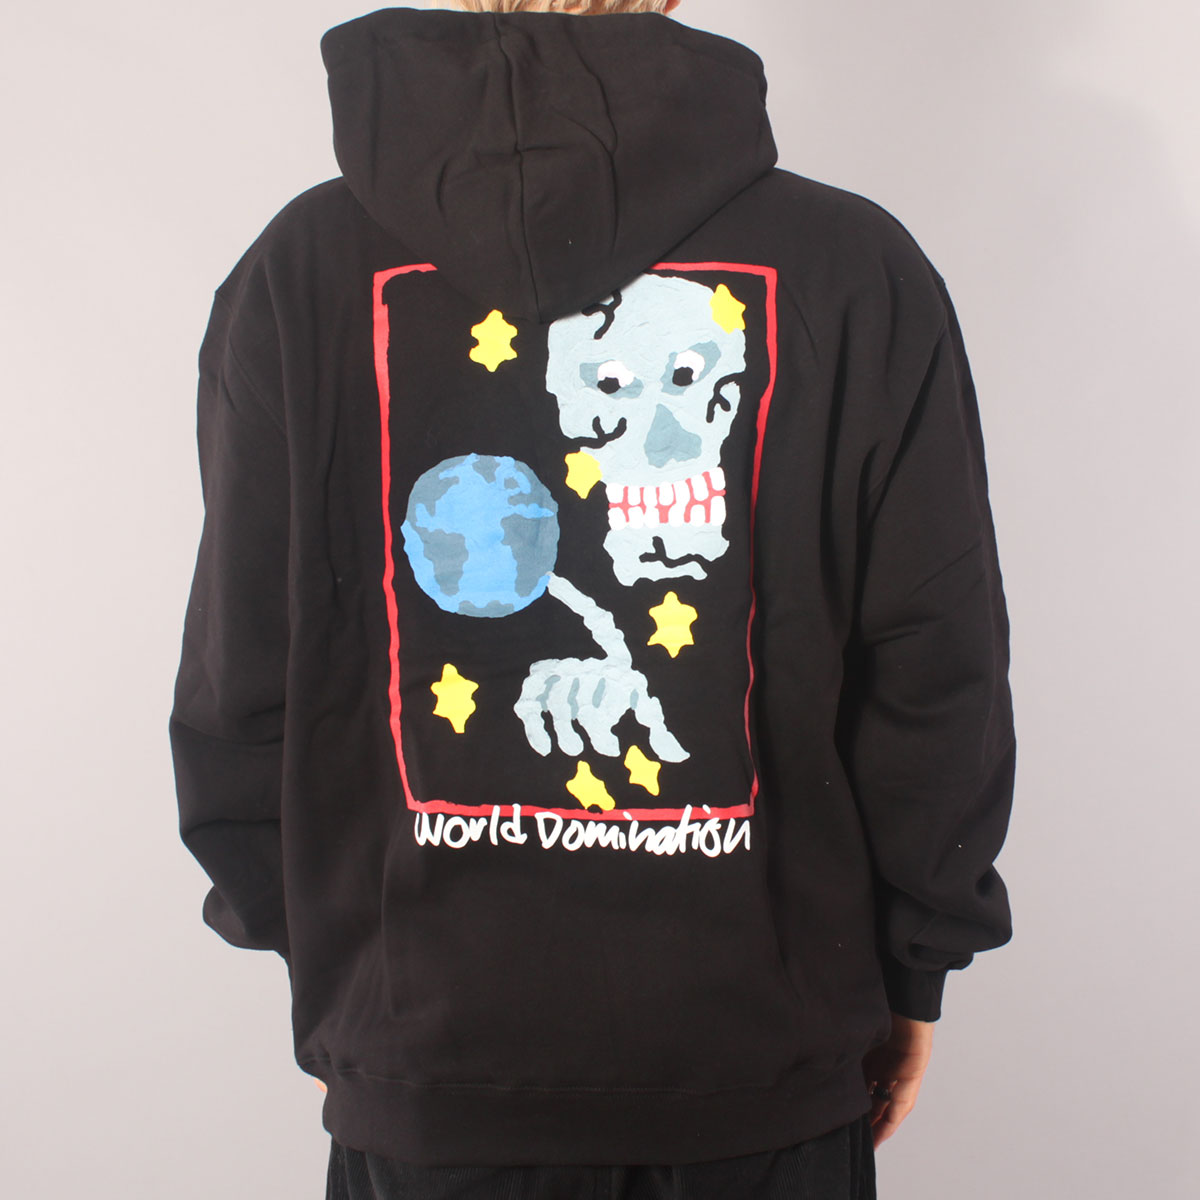 Polar Skate Co World Domination Hoodie - Black